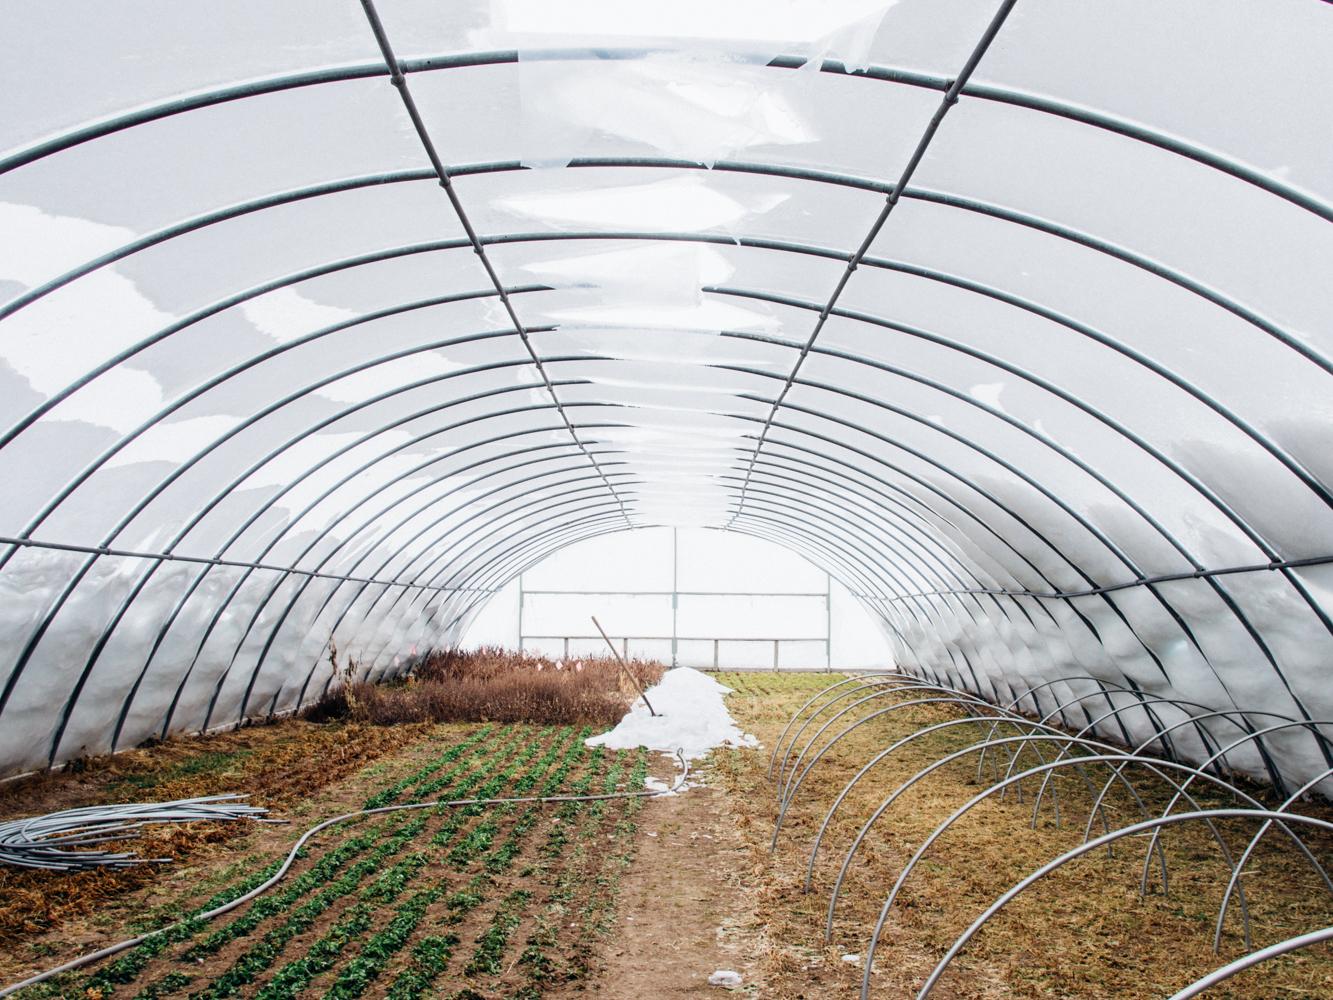 greenhouse_distruction_01_2017_web-23.jpg